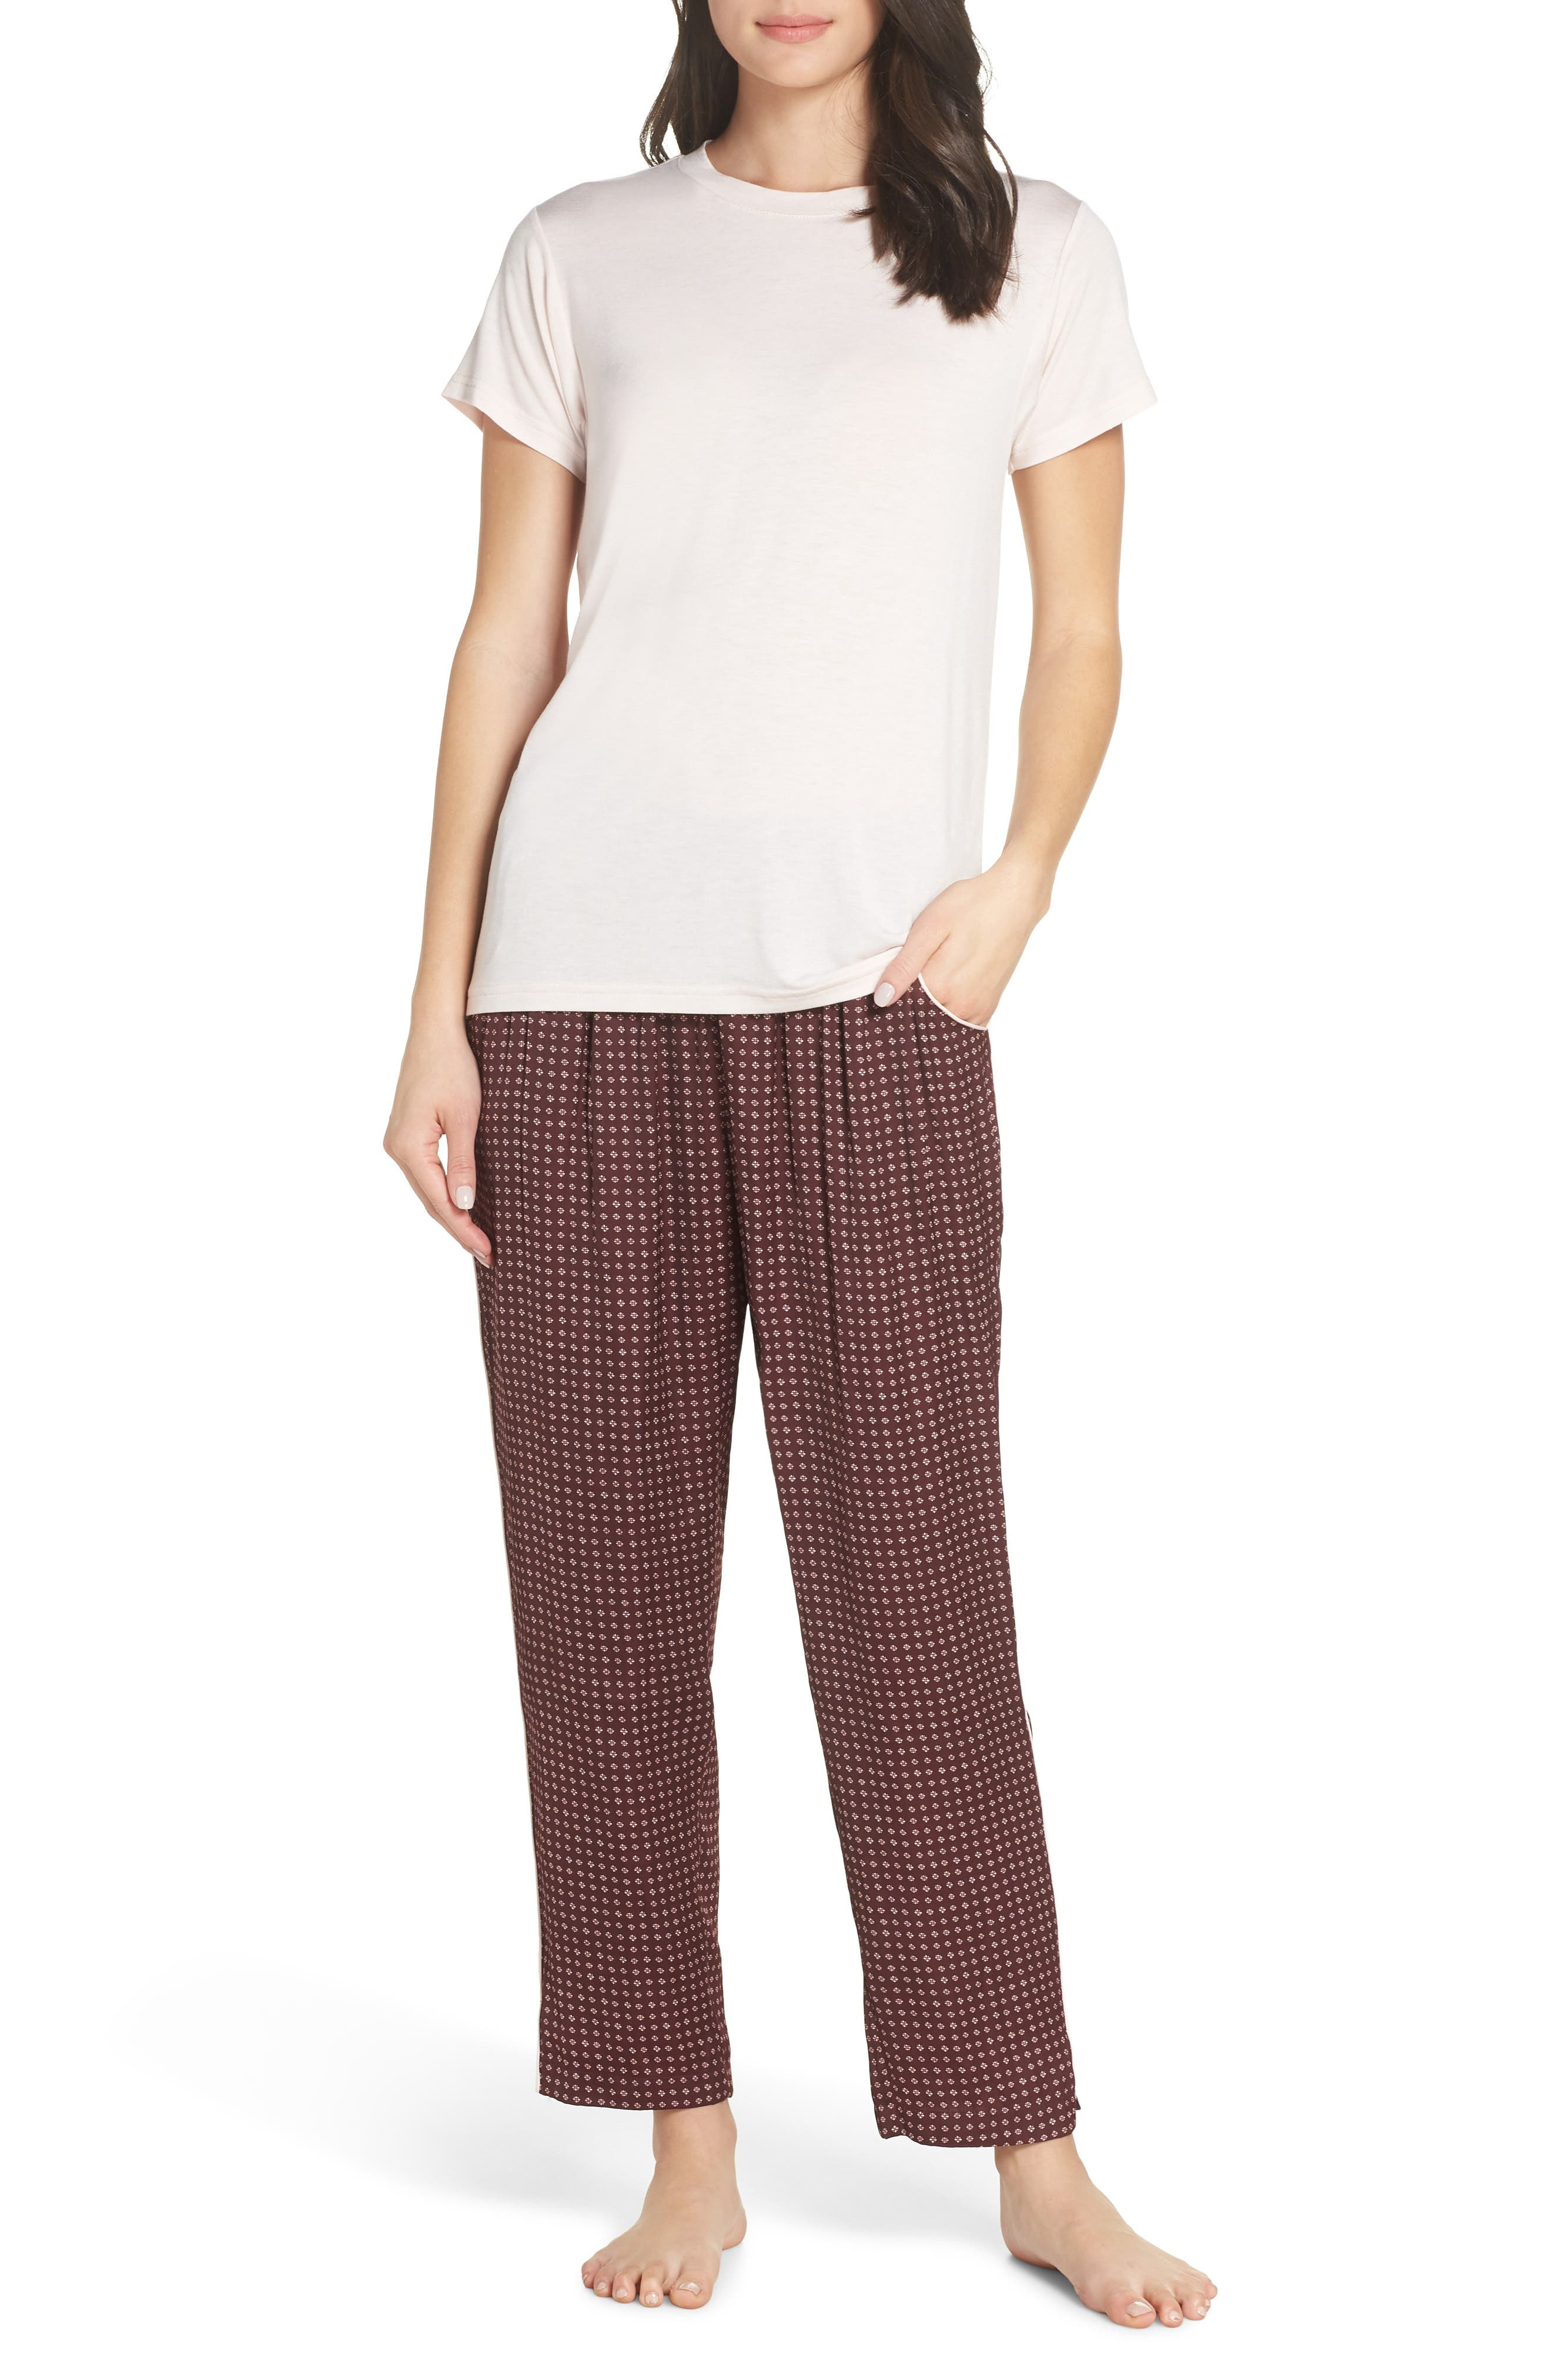 Satin Pajama Pants,                             Alternate thumbnail 8, color,                             610